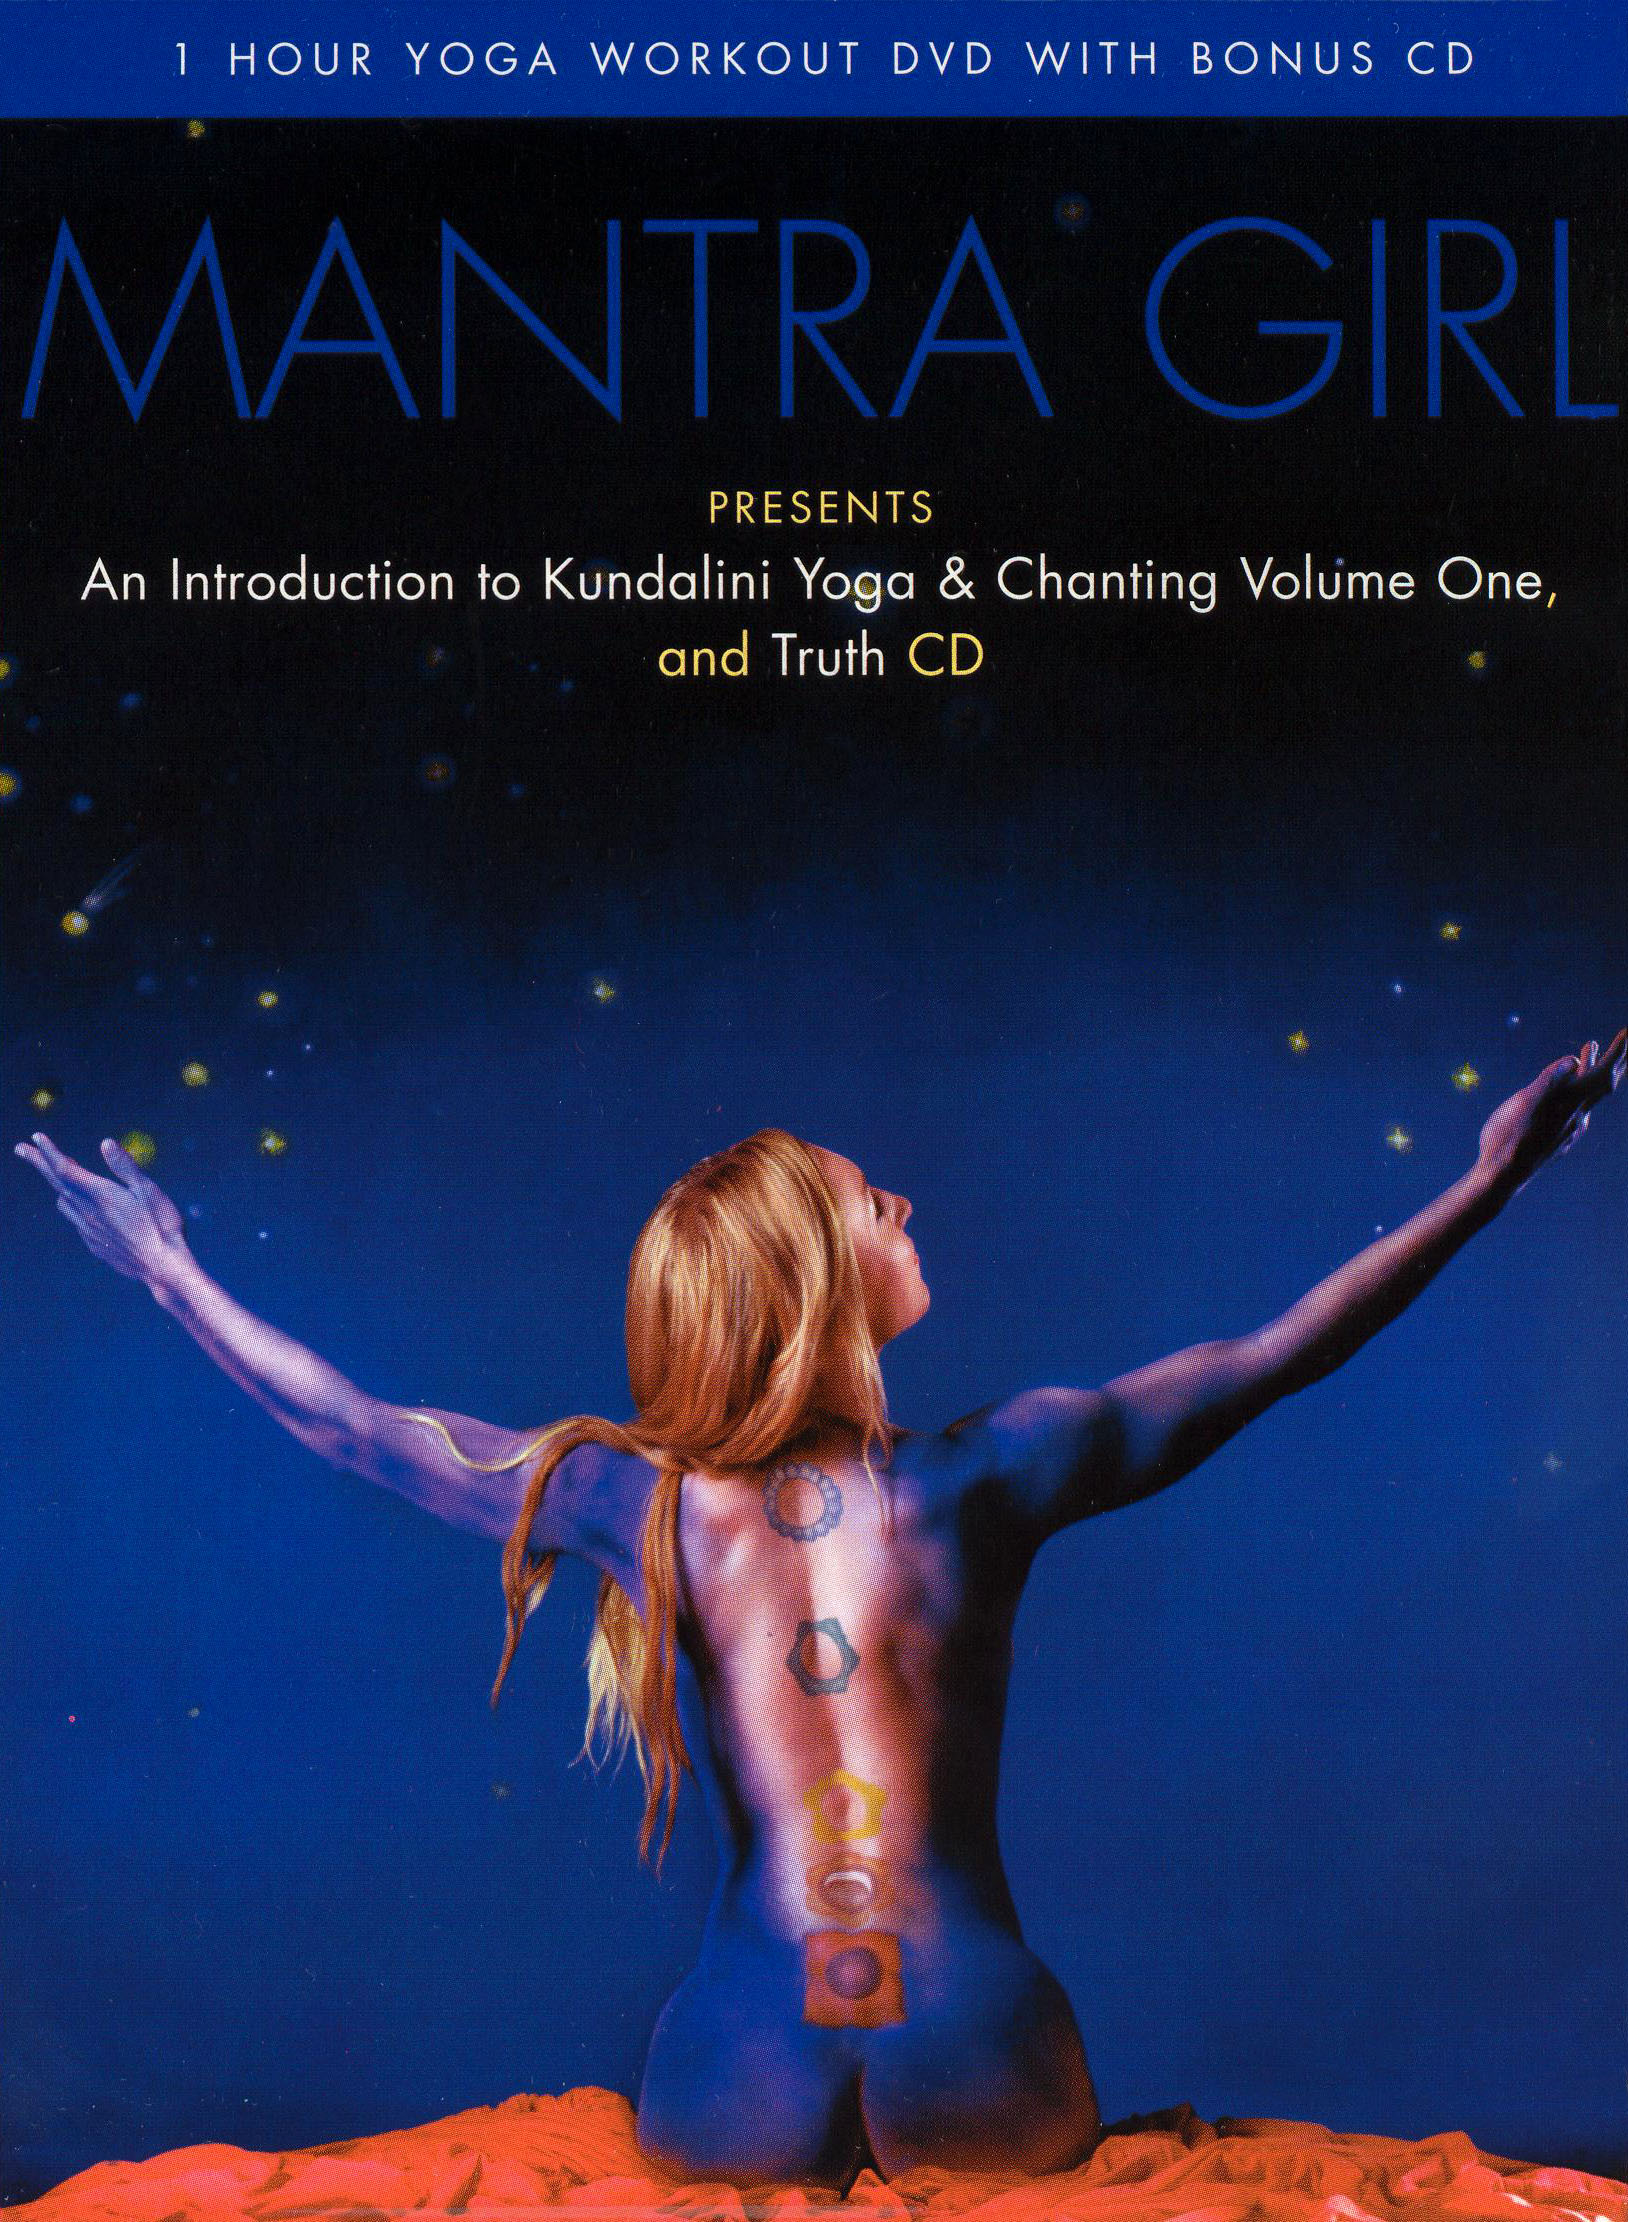 Mantra Girl: An Introduction To Kundalini Yoga and Chanting, Vol. 1